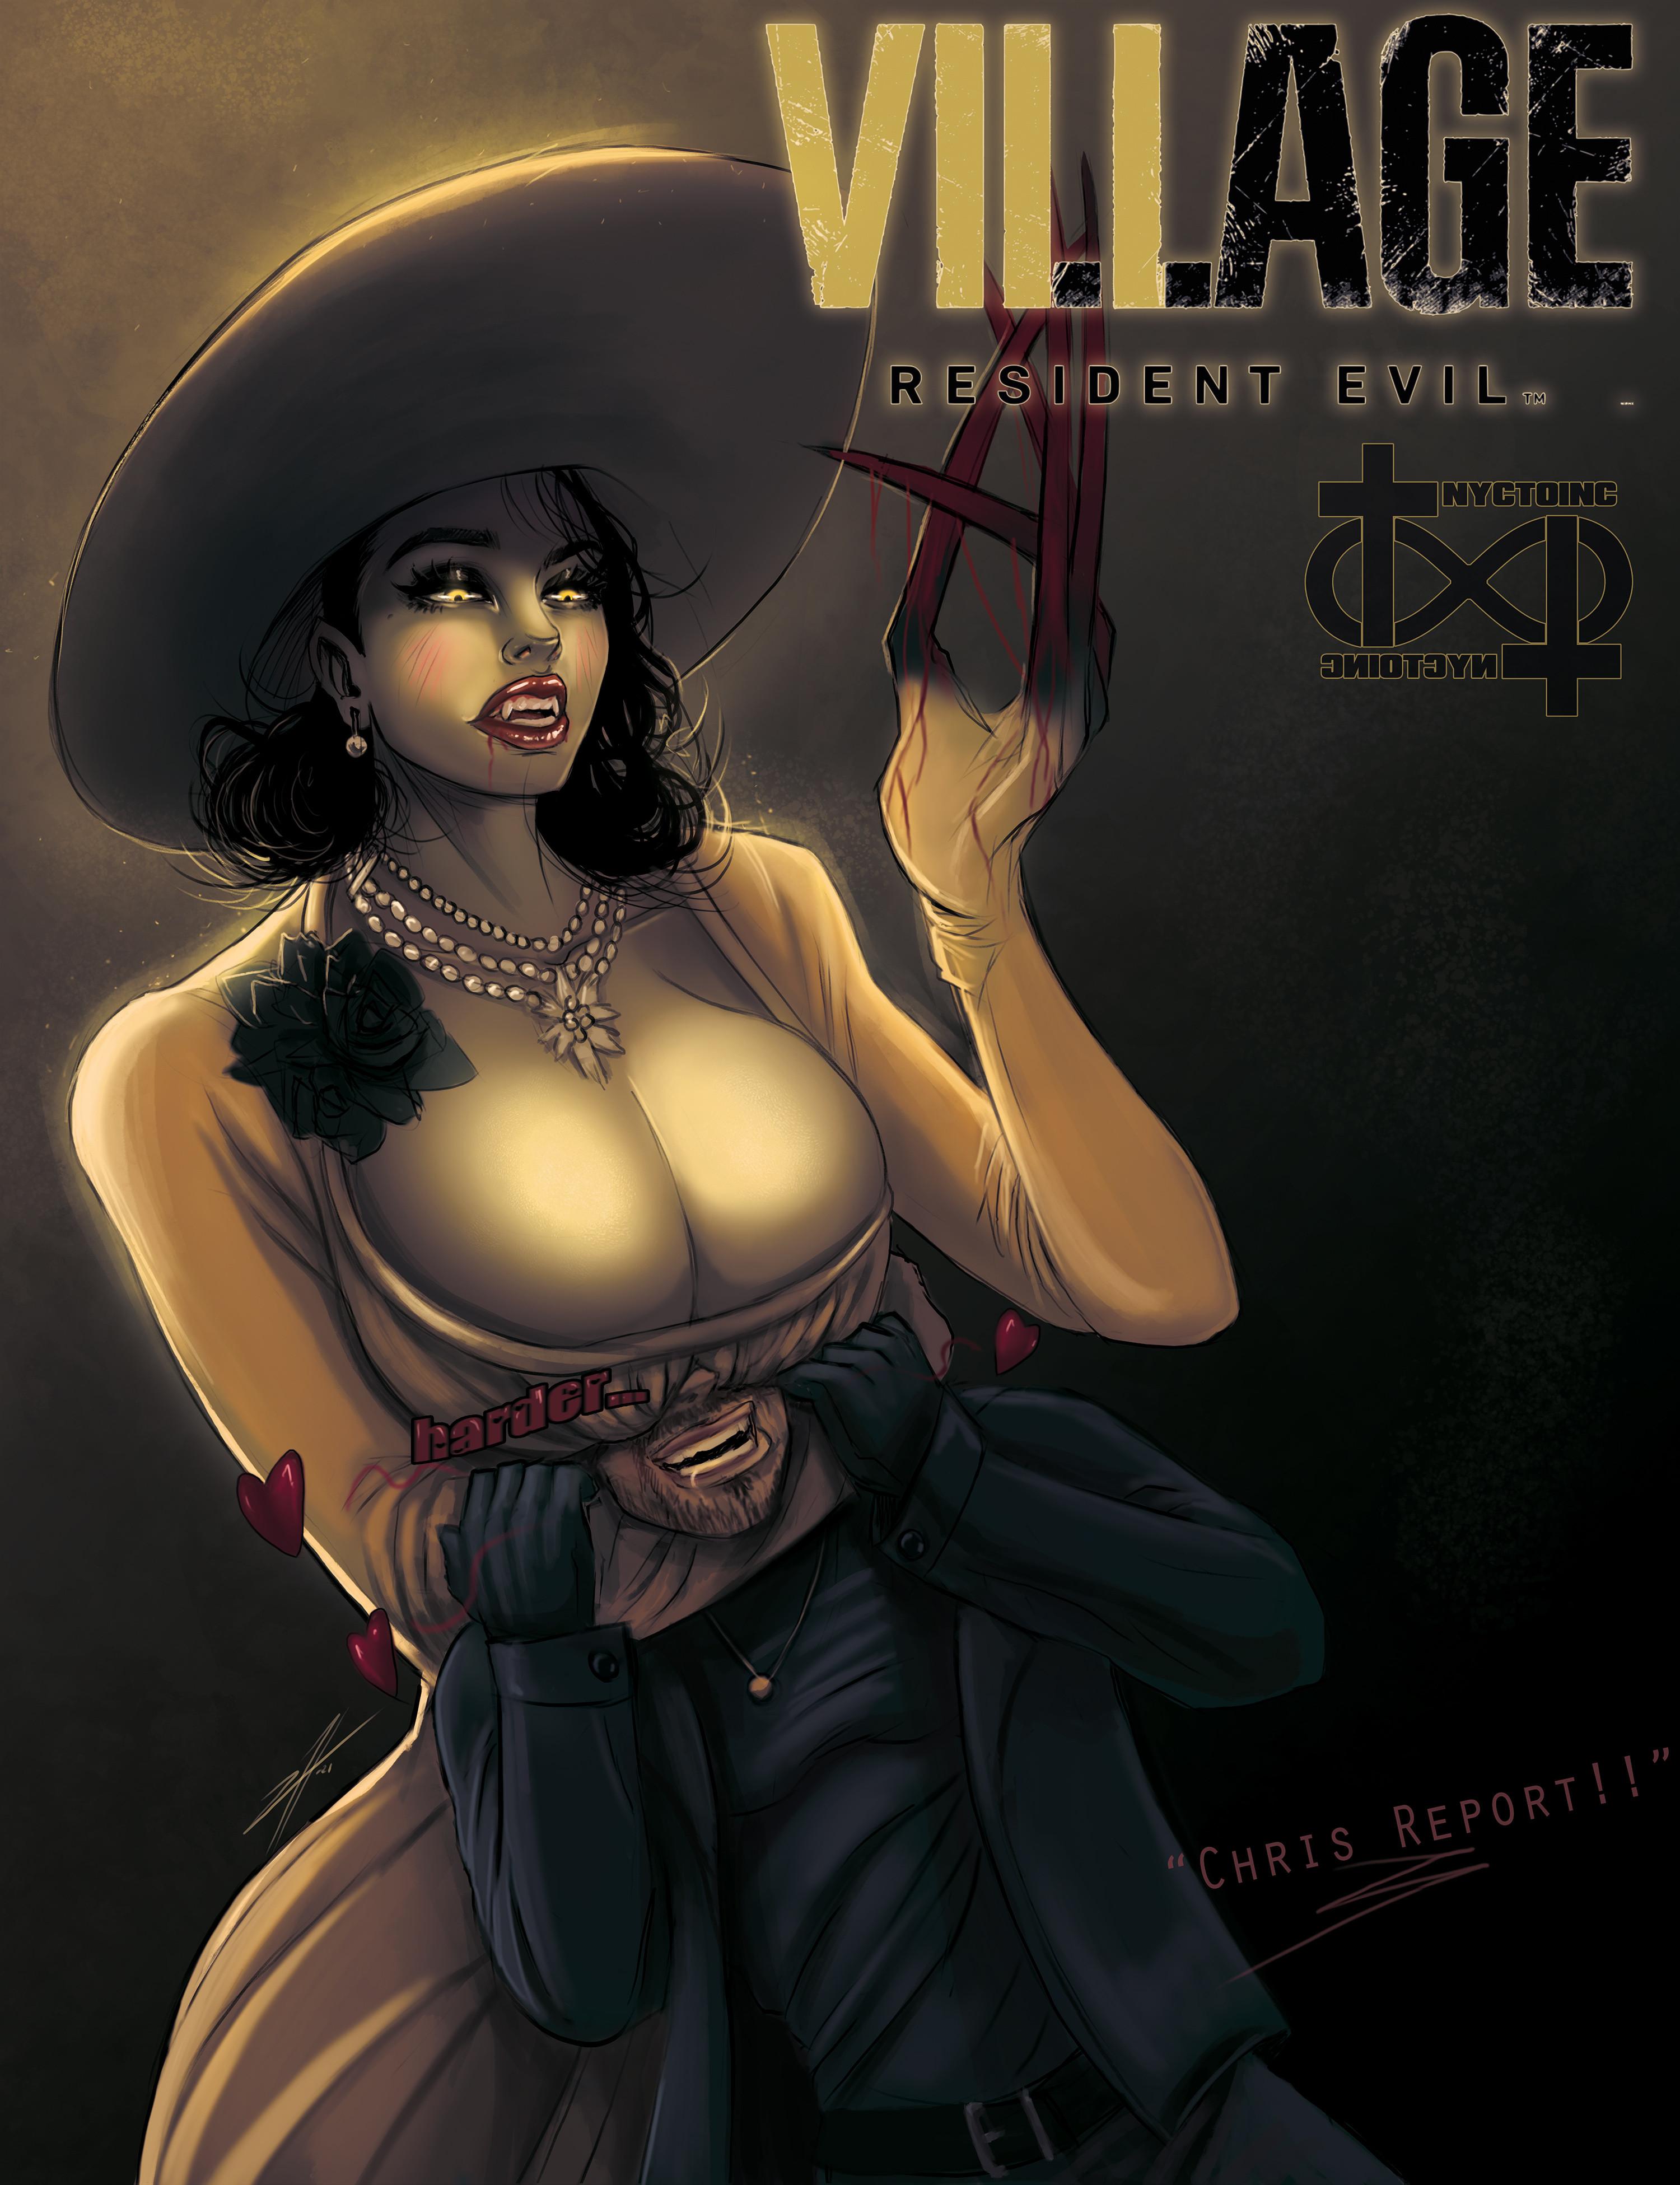 Милфология Леди Димитреску — 50 фанатских артов Resident Evil Village